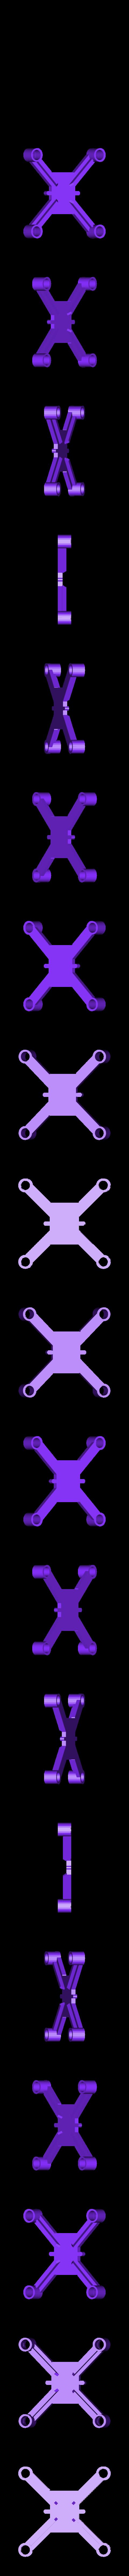 dronedrame_8.5mm_motors_lite.stl Download free STL file Drone Frame for all motor sizes ! - 6mm,6.5mm,7mm,7.5mm,8mm,8.5mm • 3D printable model, Gophy